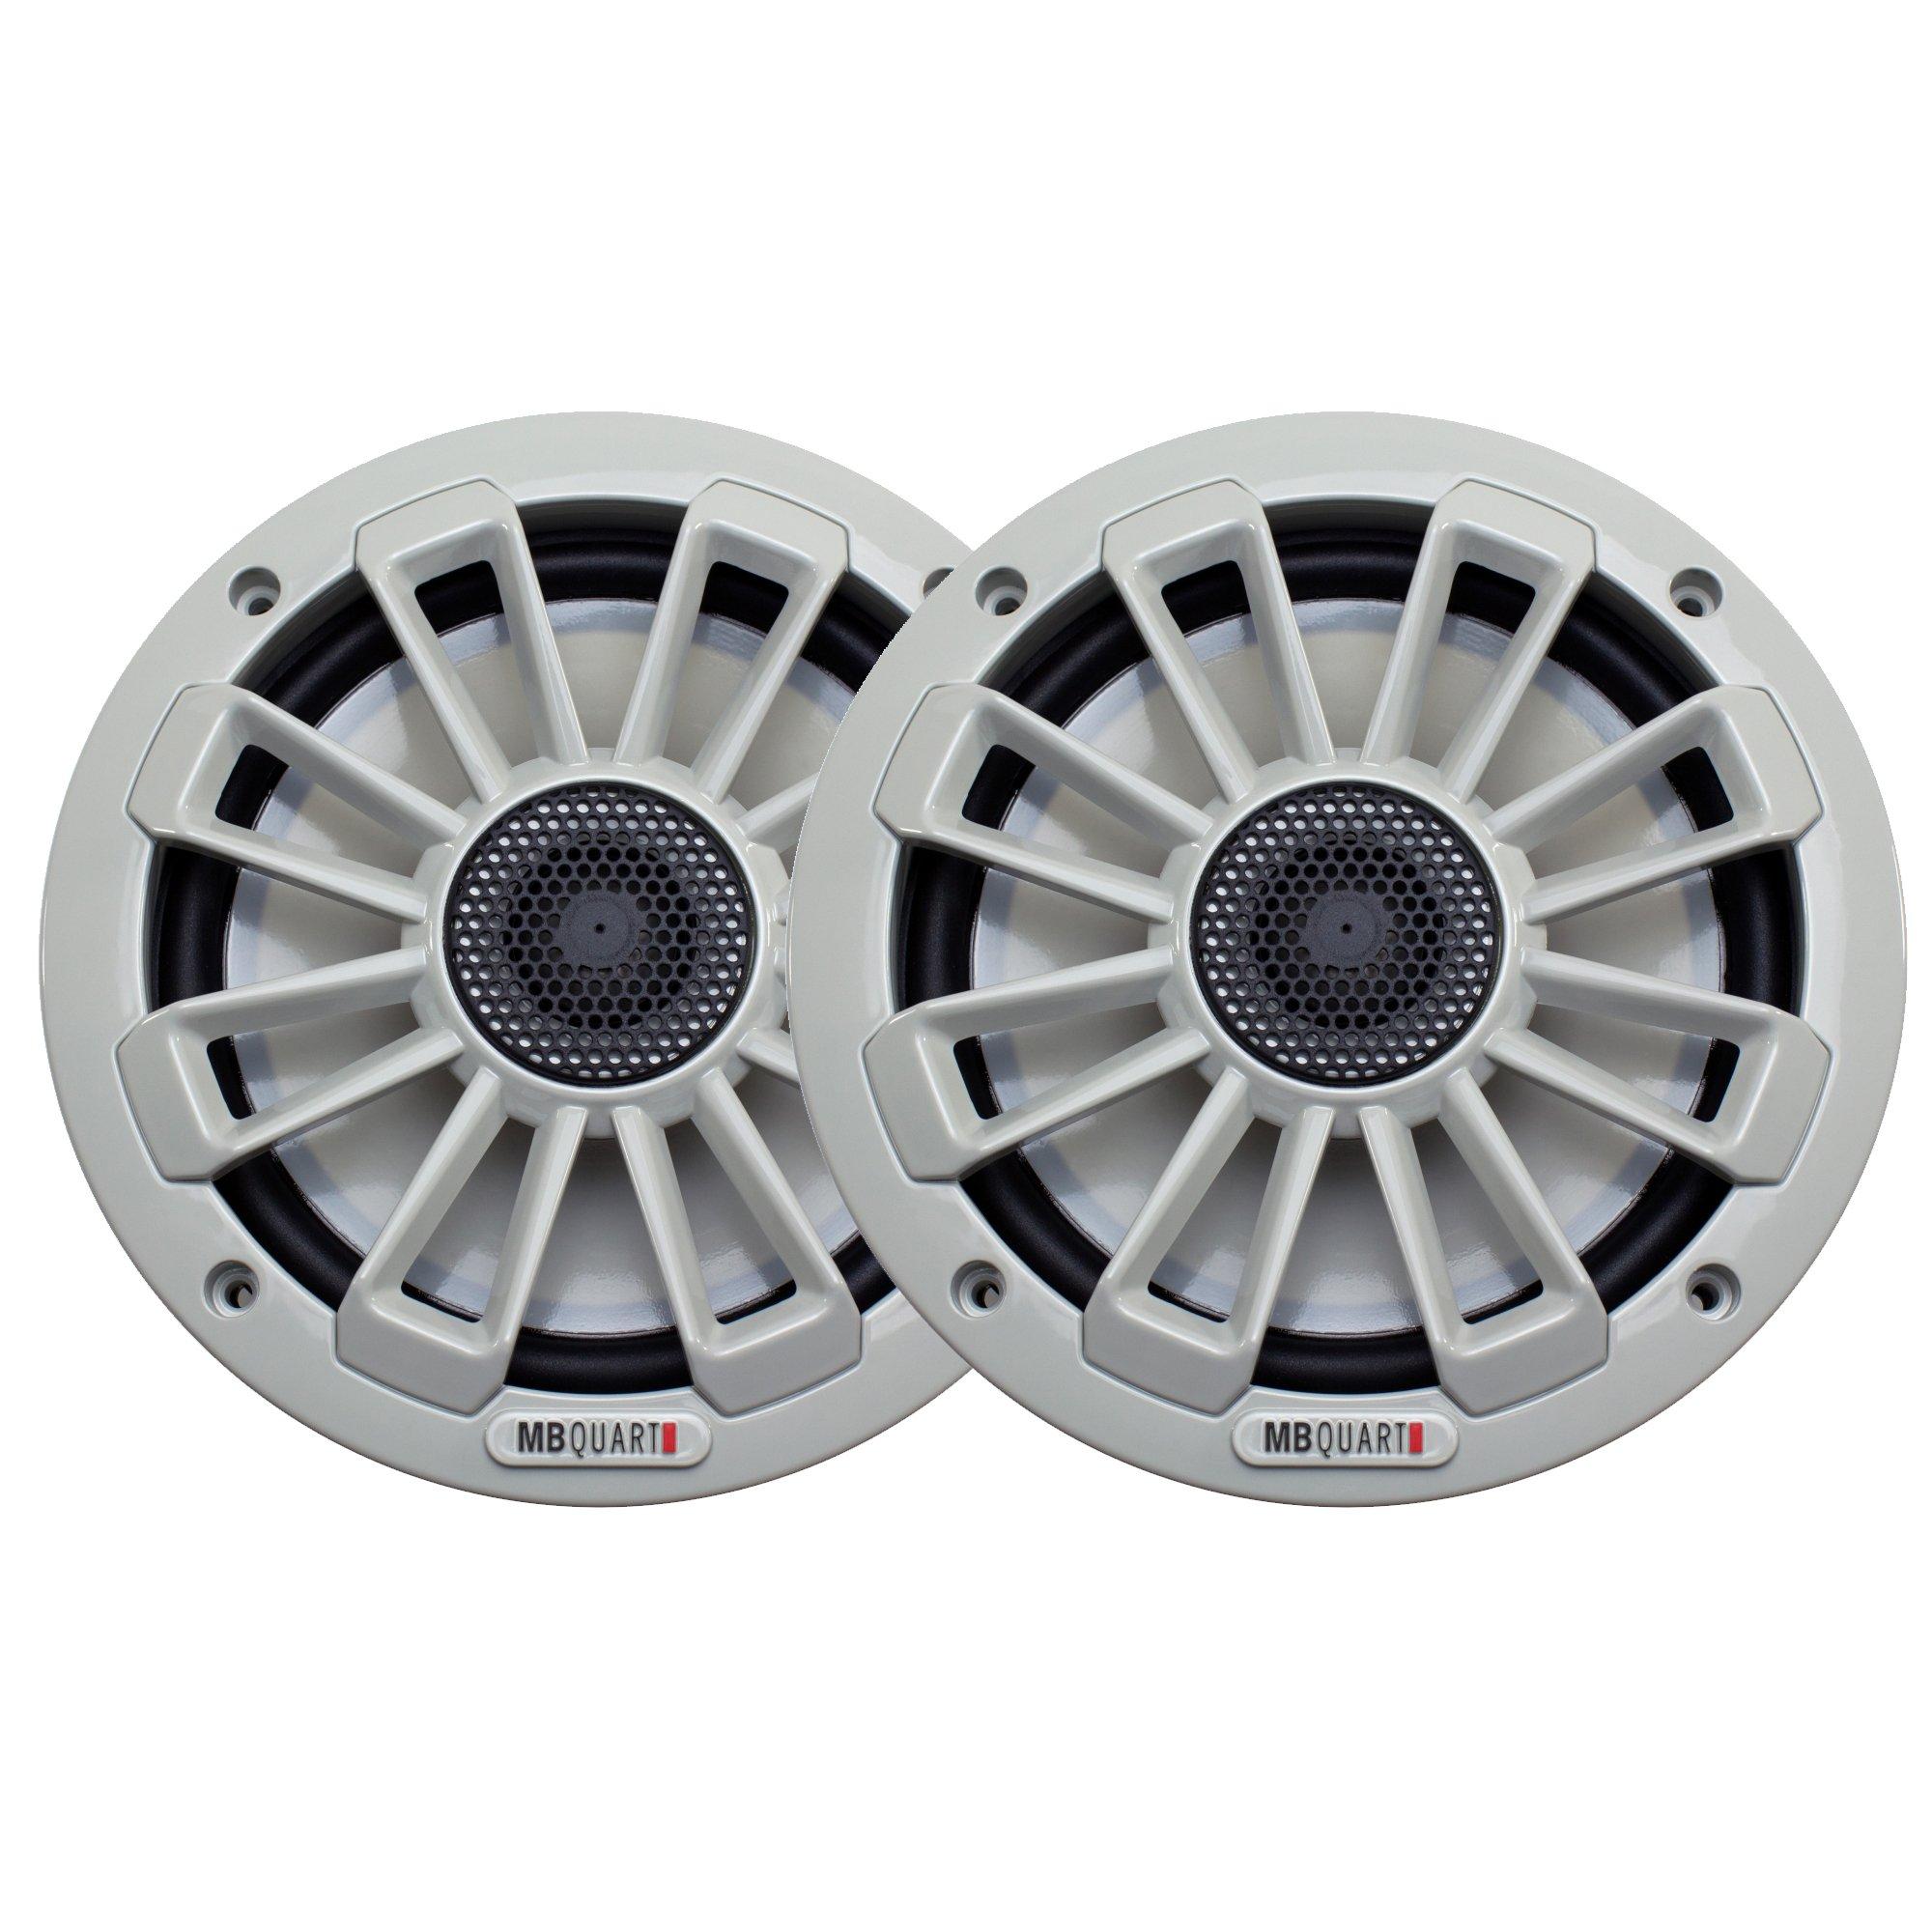 MB Quart NK1-116 Nautic Series Light Gray 6-3/4'' Marine Speakers (Pair)